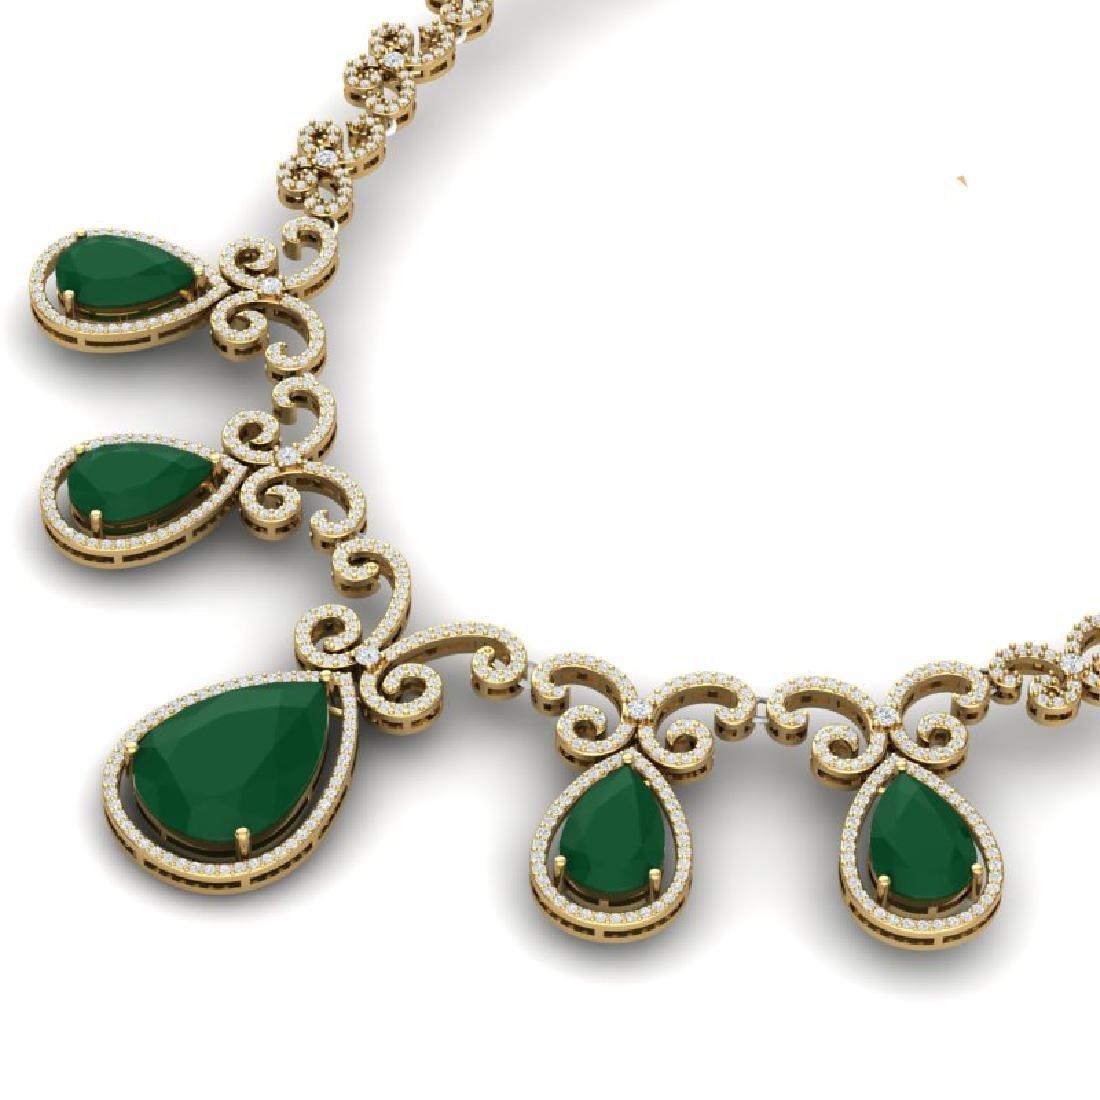 38.42 CTW Royalty Emerald & VS Diamond Necklace 18K - 2